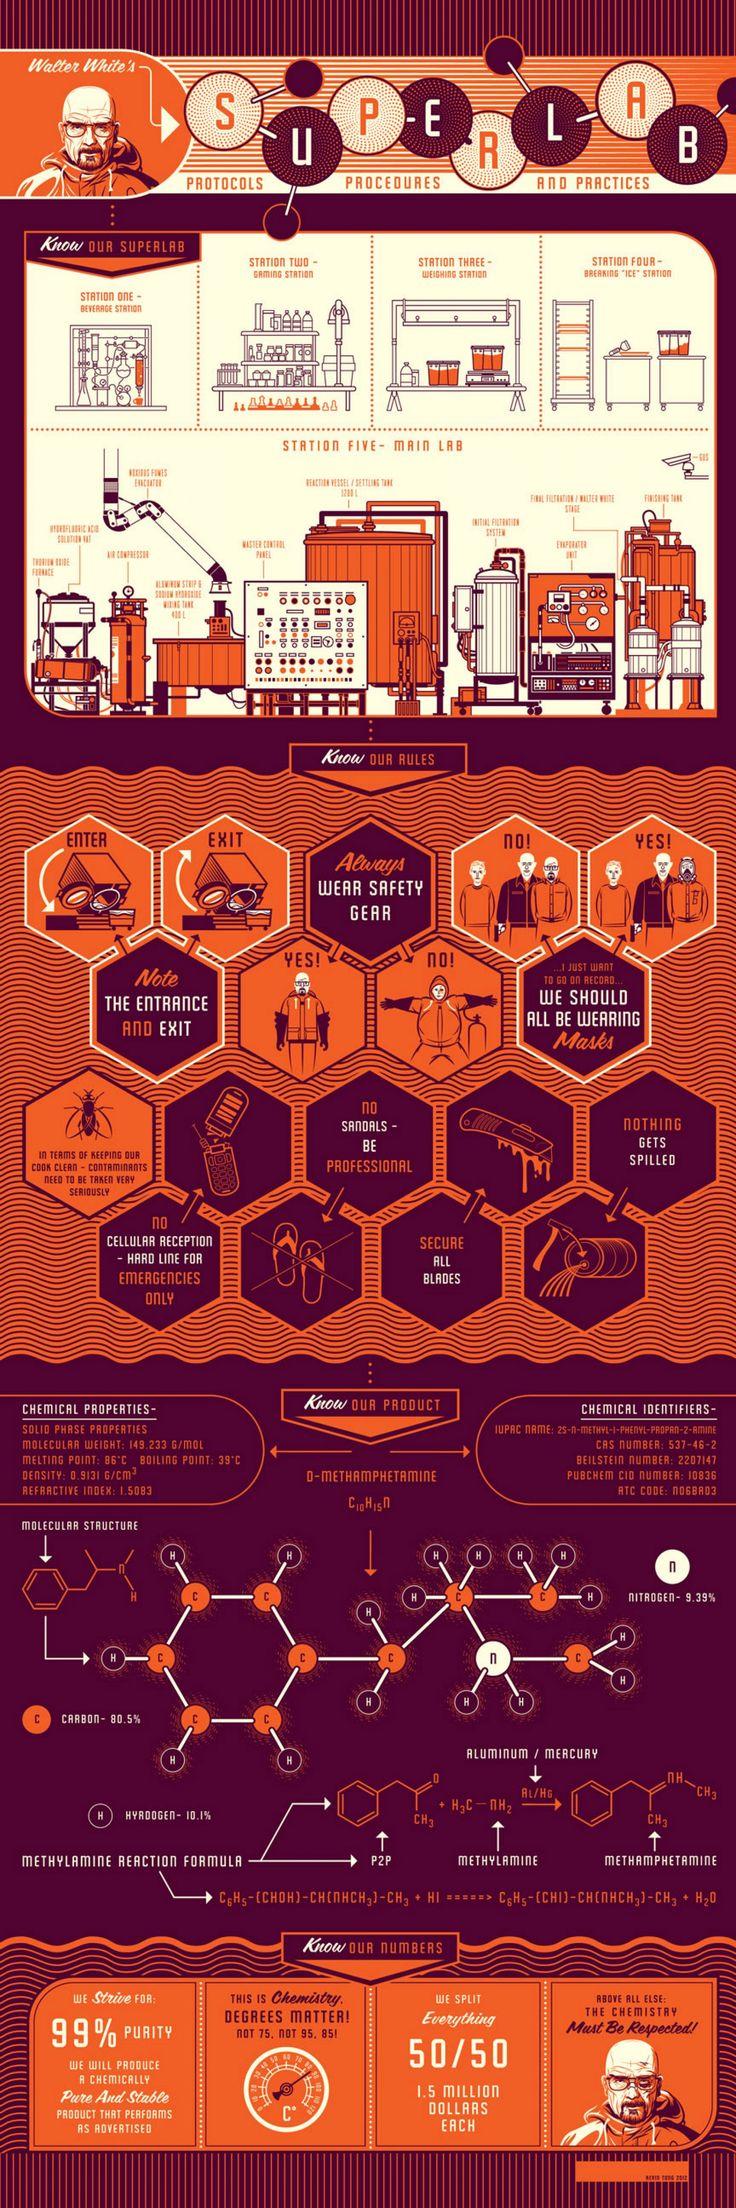 Inside Walt's Superlab Infographic